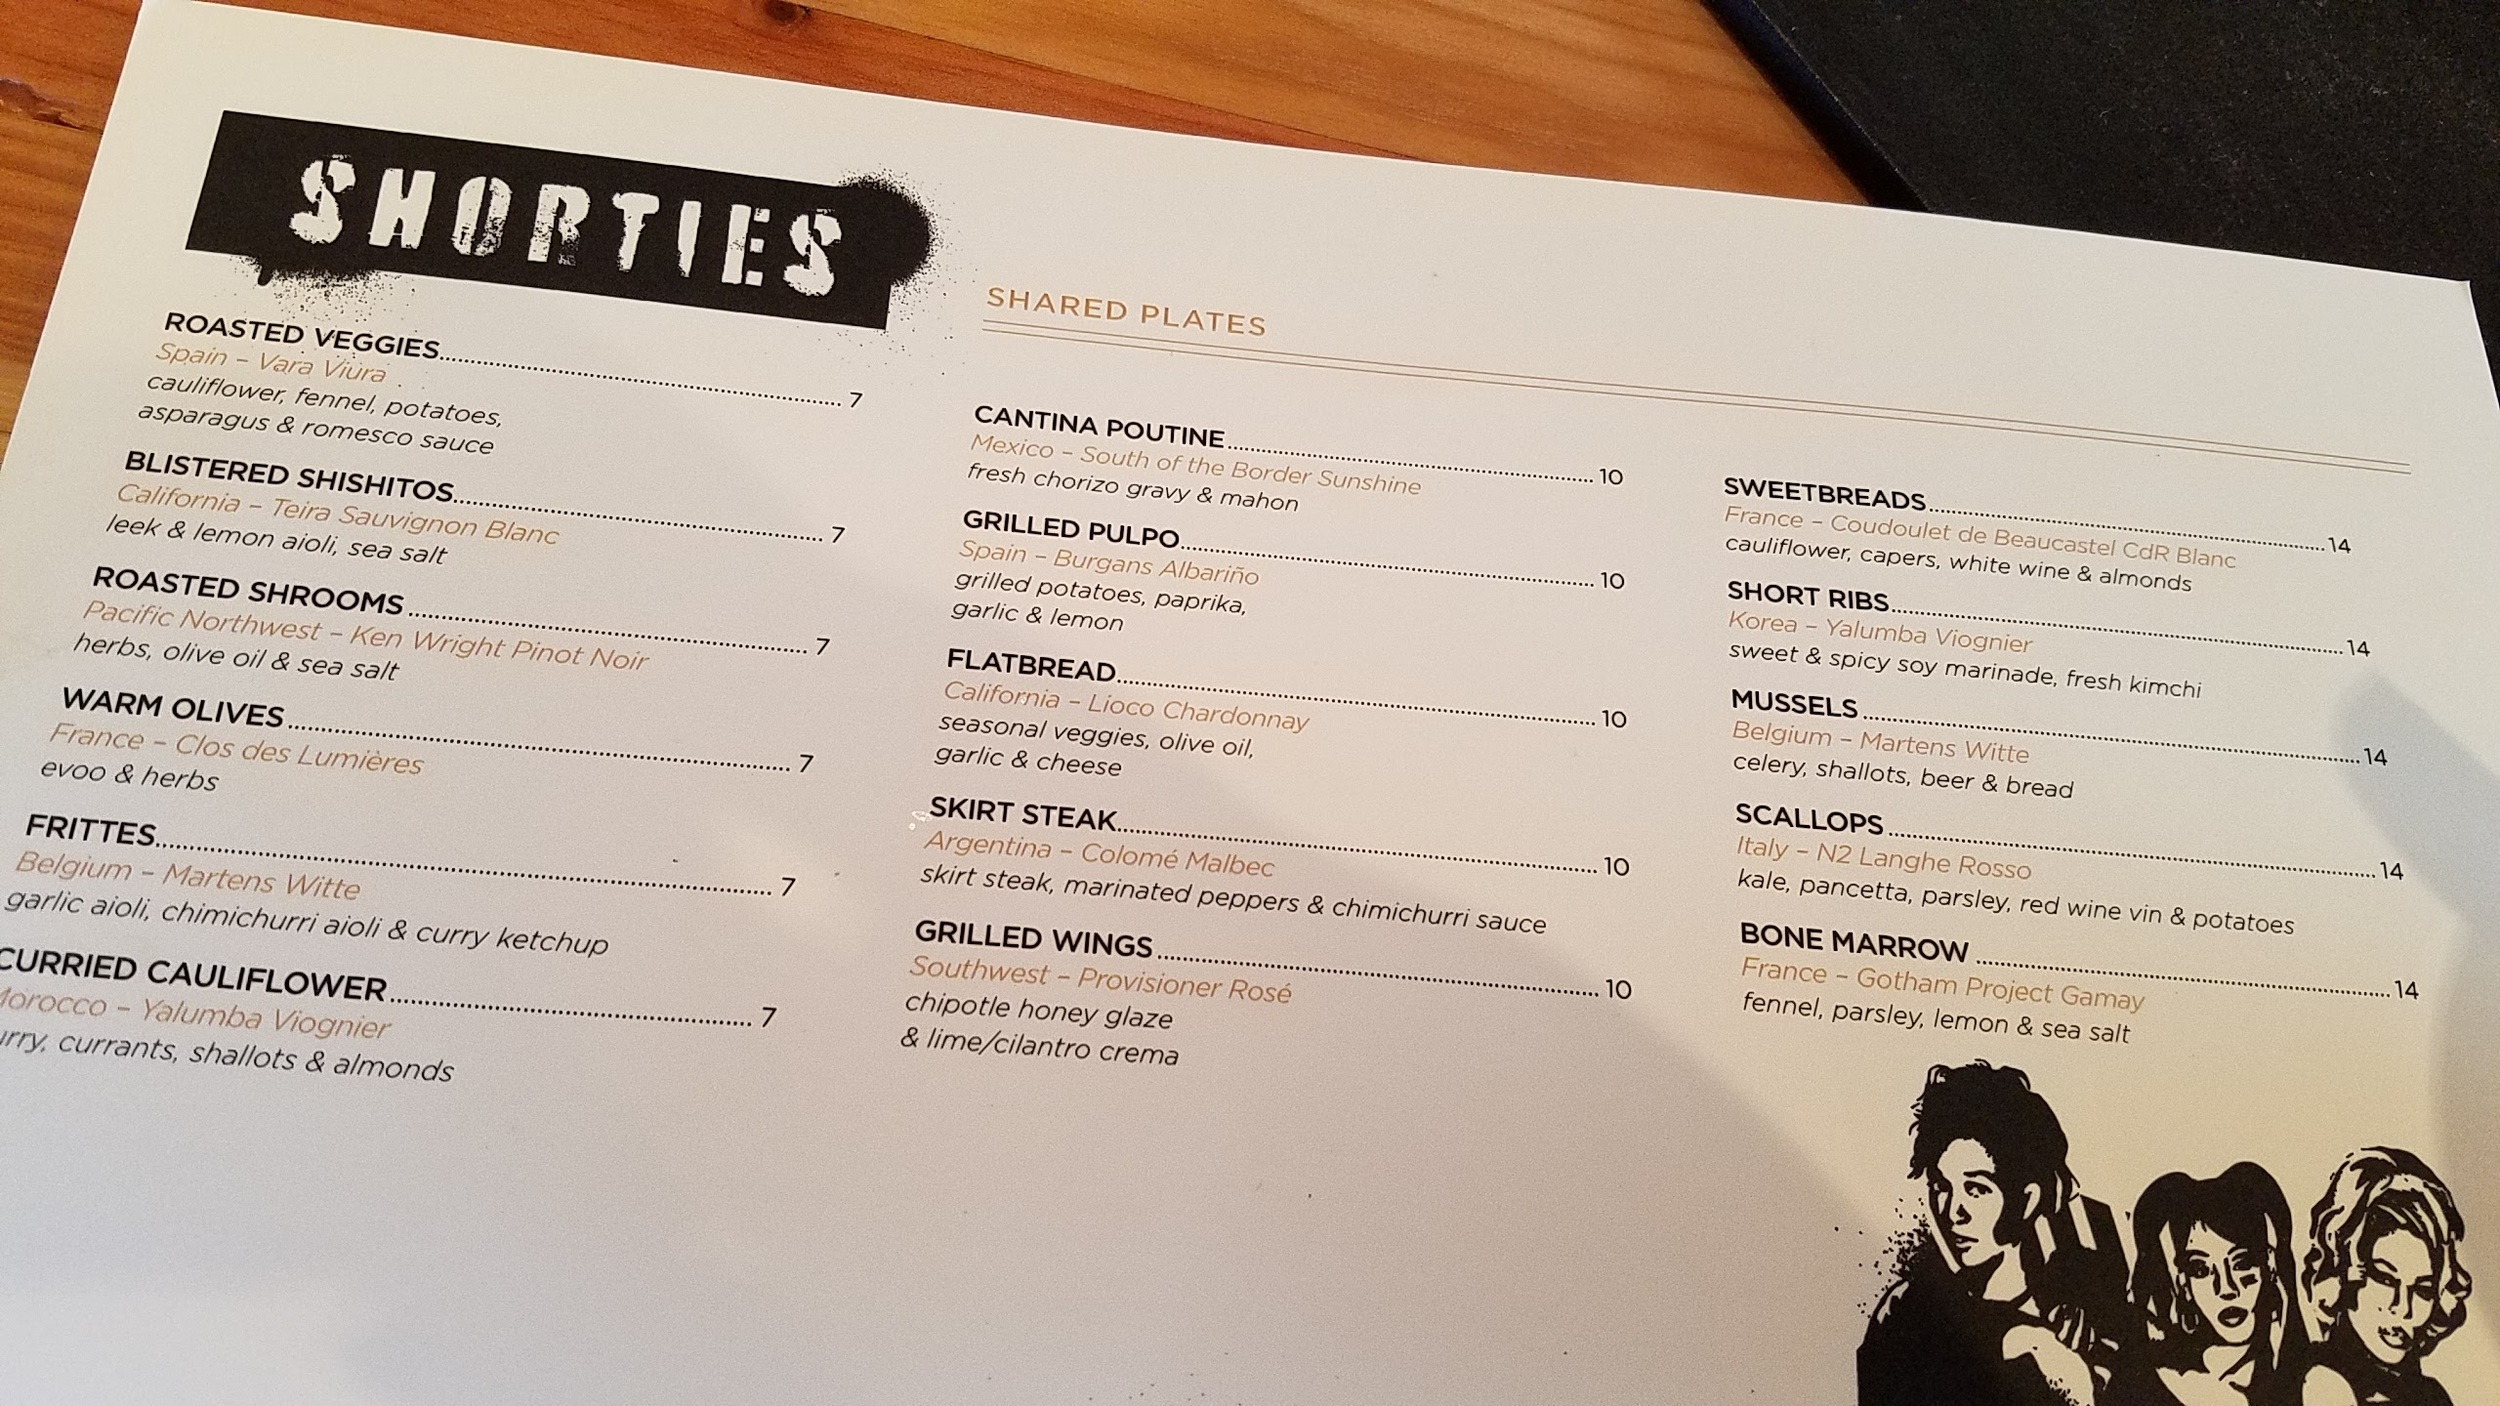 Shared plates menu